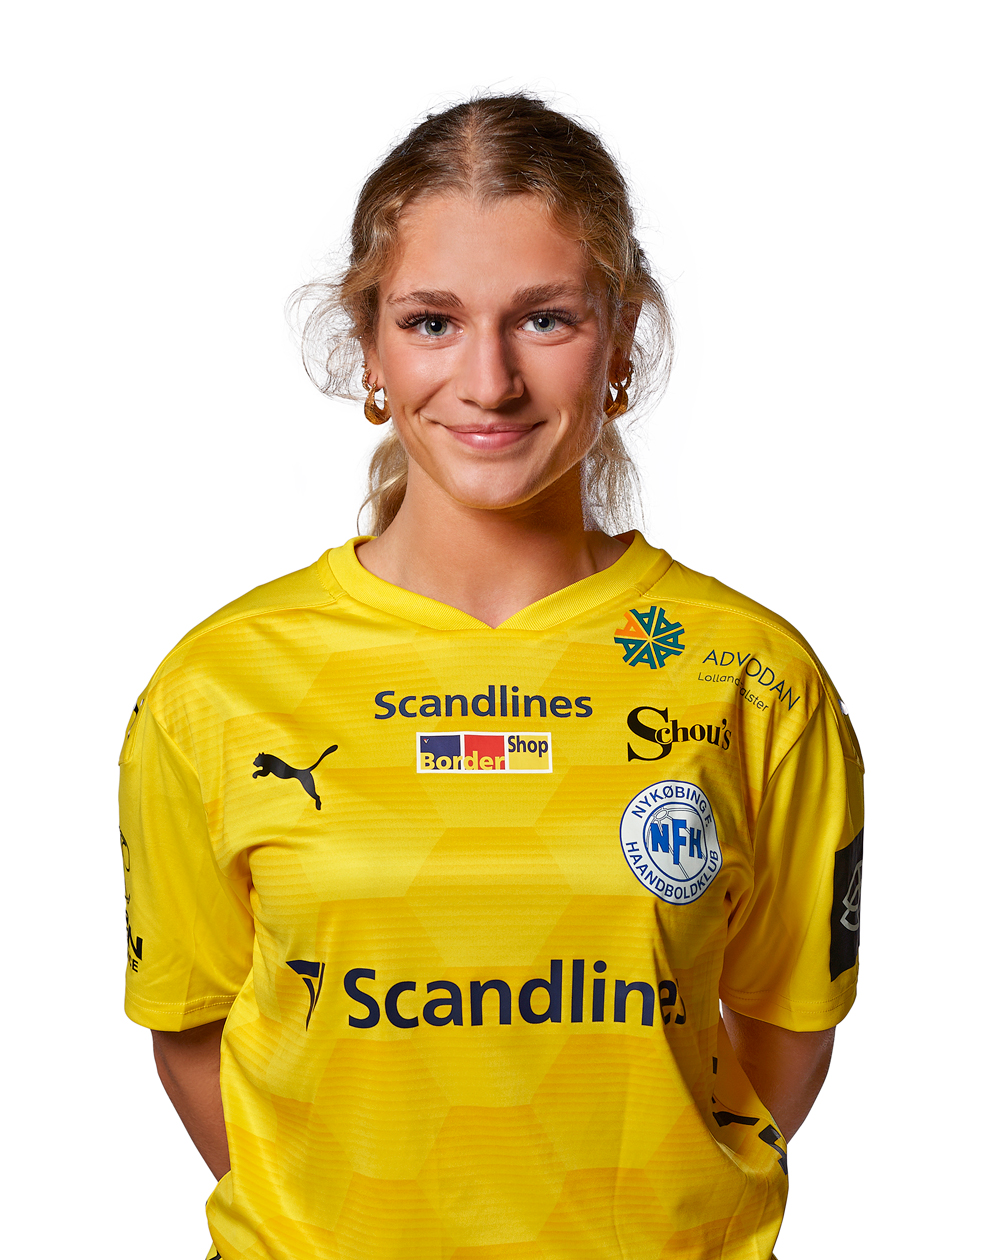 Jo Lund Nielsen